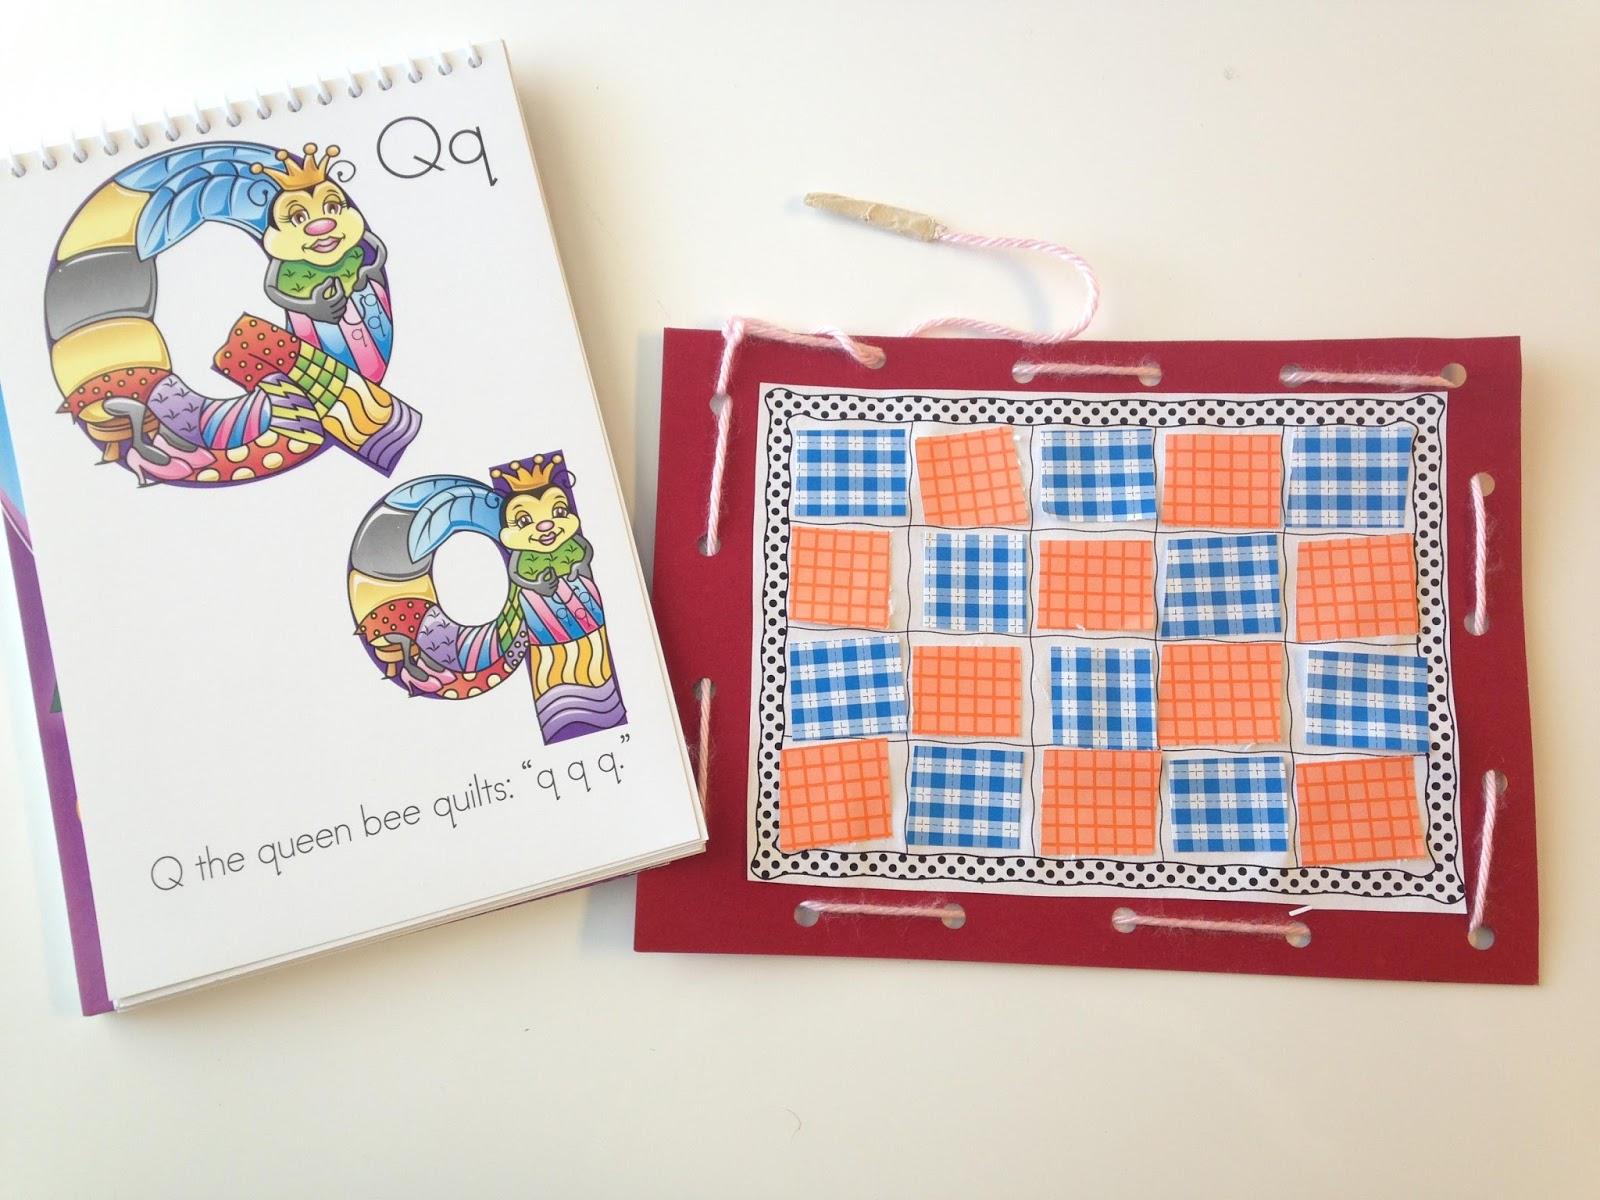 Amazing Action Alphabet Quilting On Q Day In Preschool